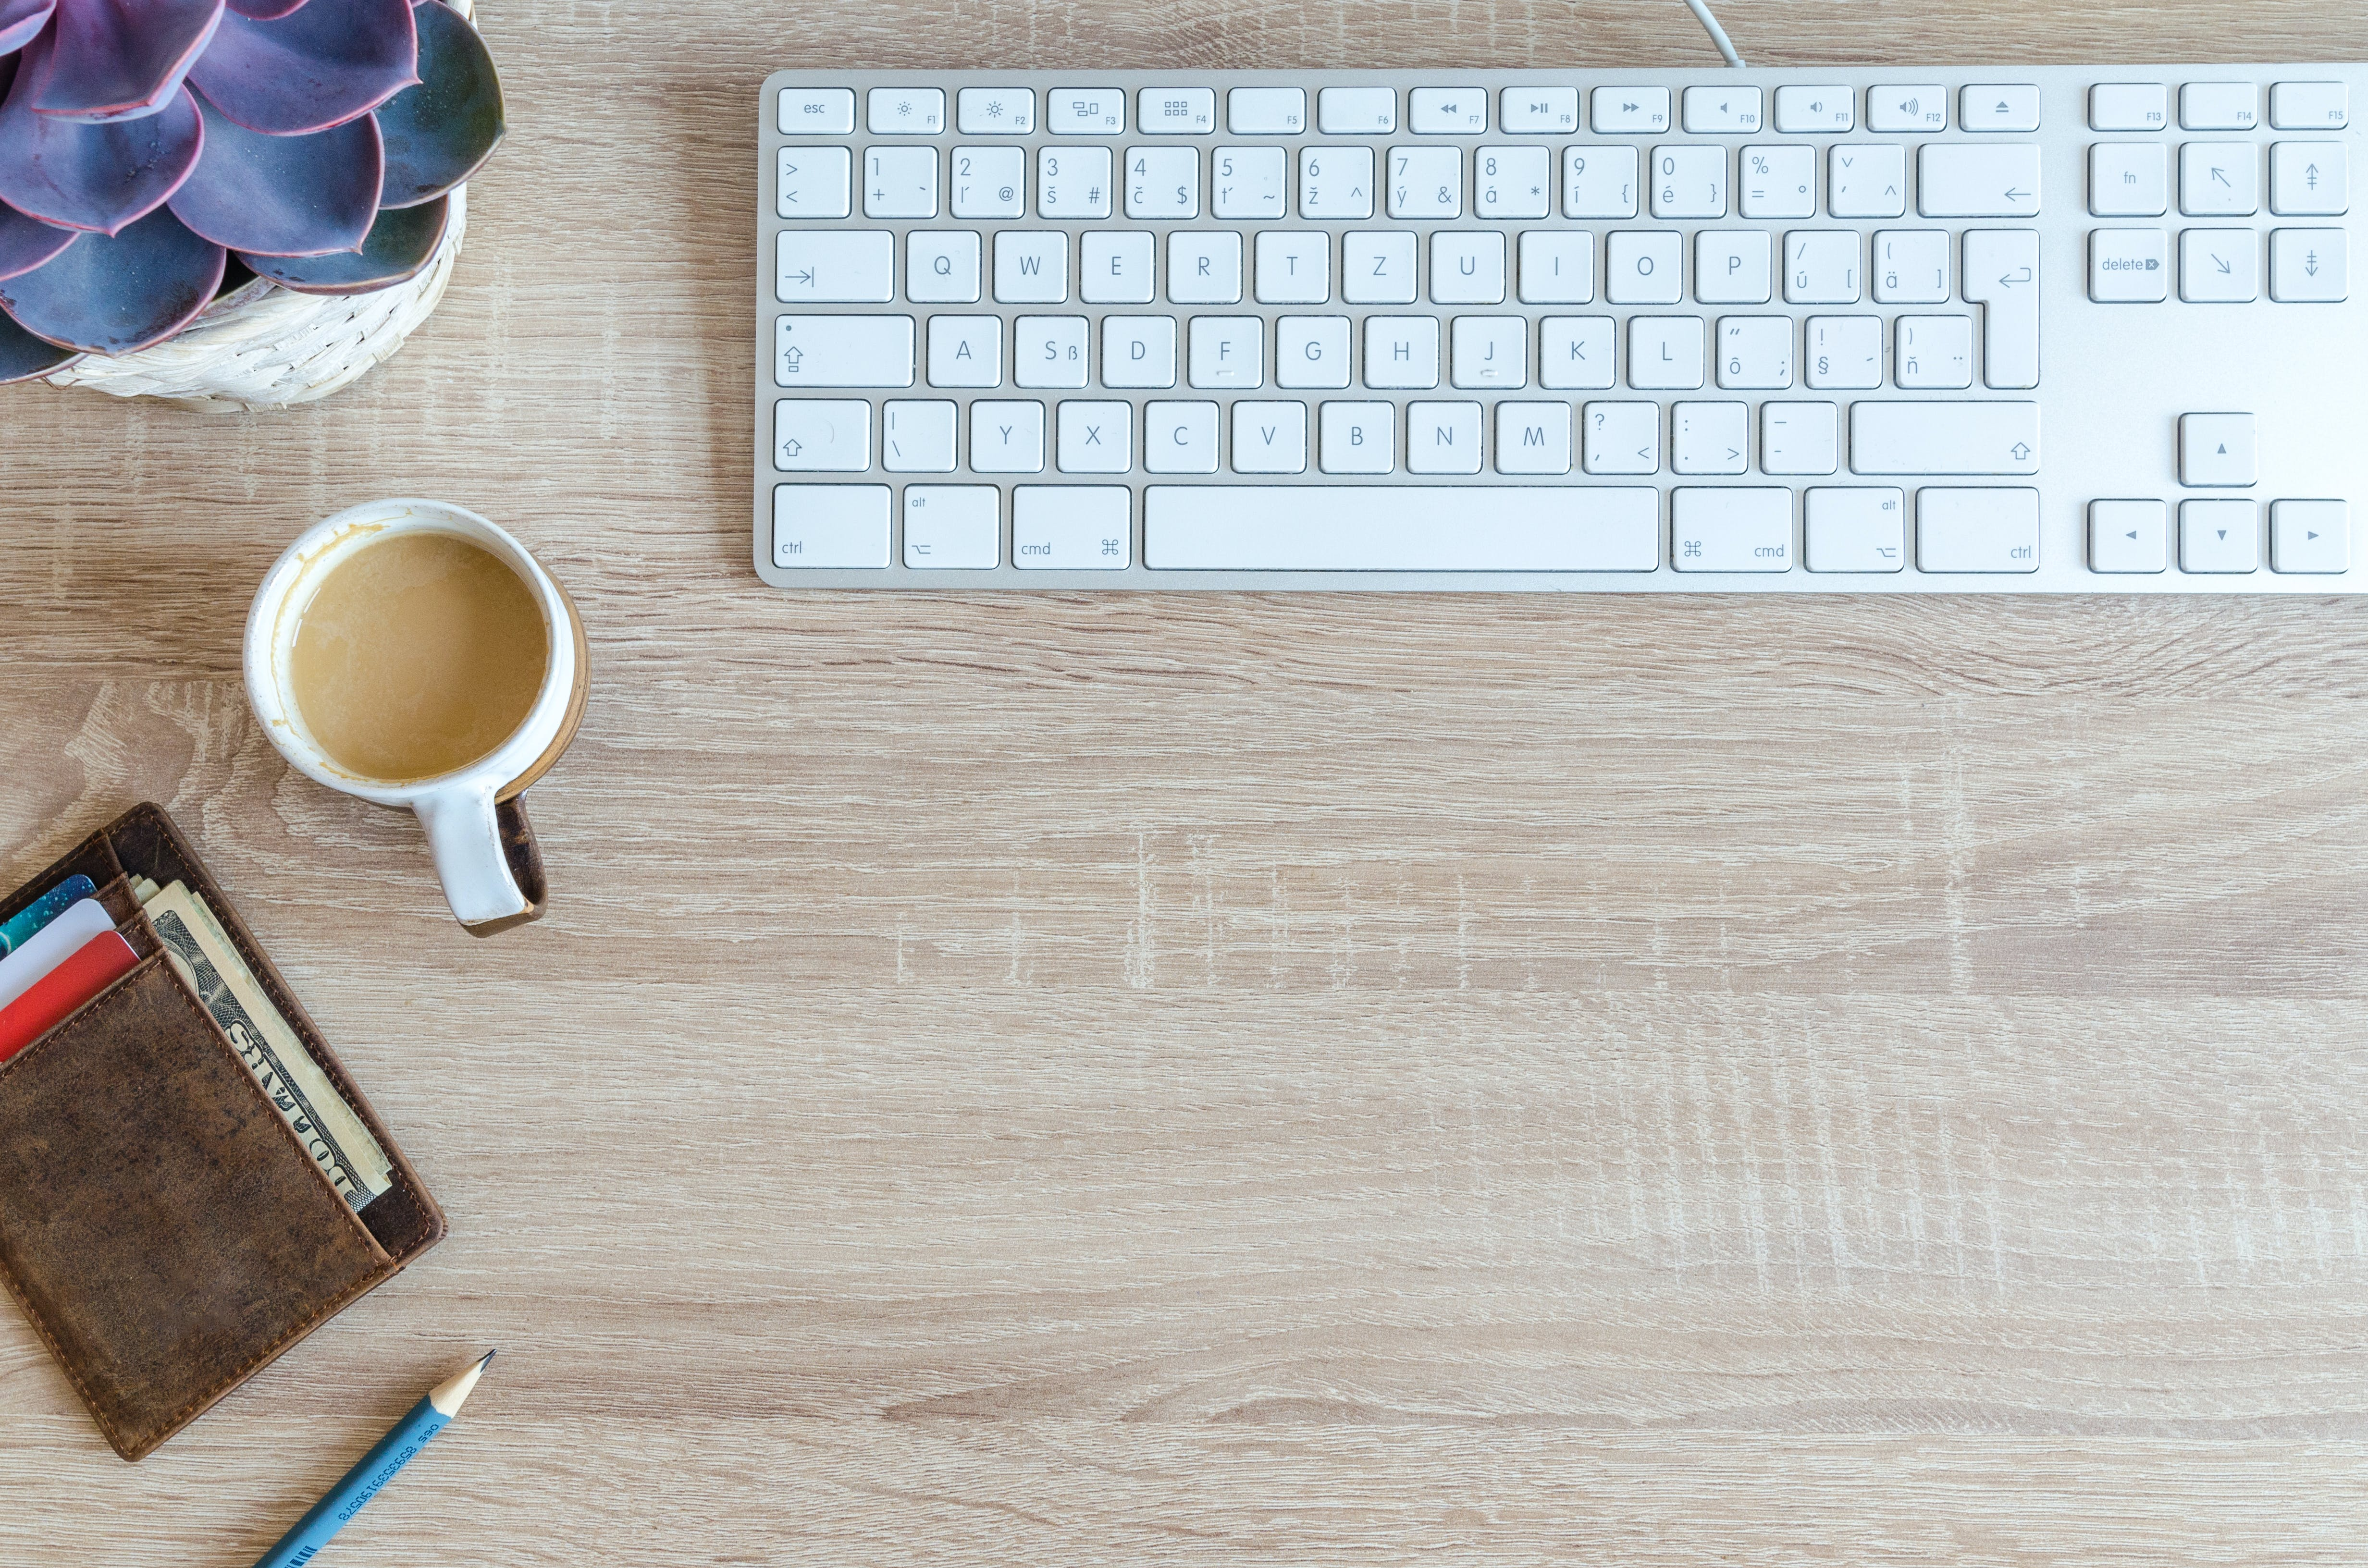 Cup of Coffee Near Keyboard on Table Top